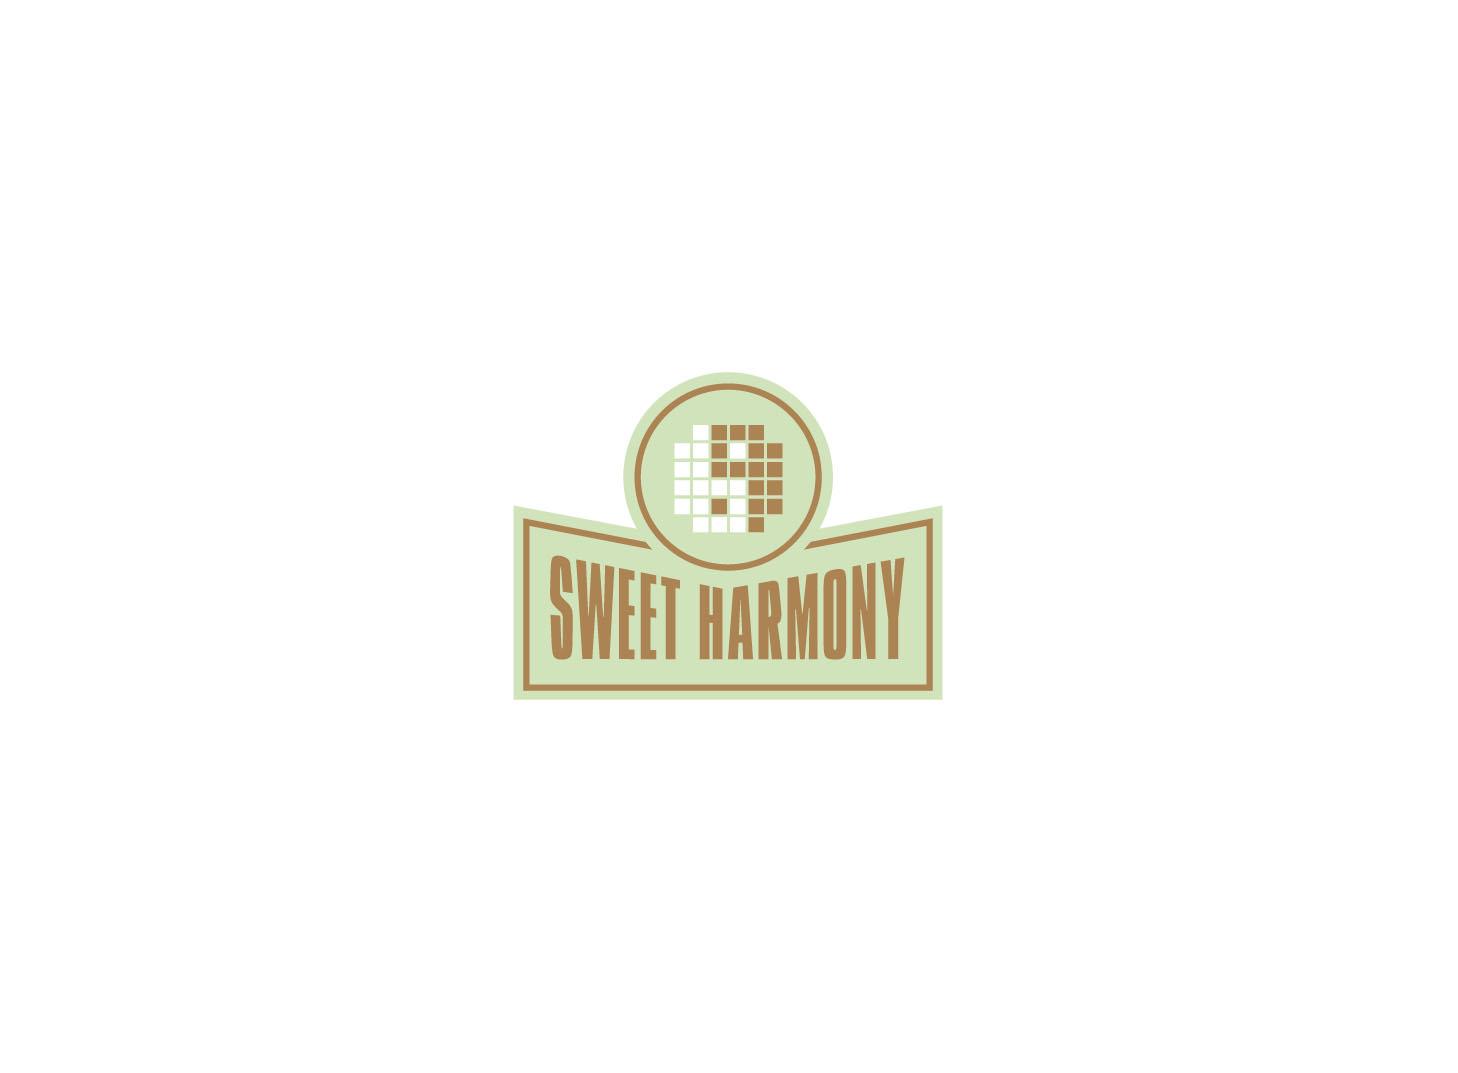 sandor laszlo design: Sweet Harmony logo